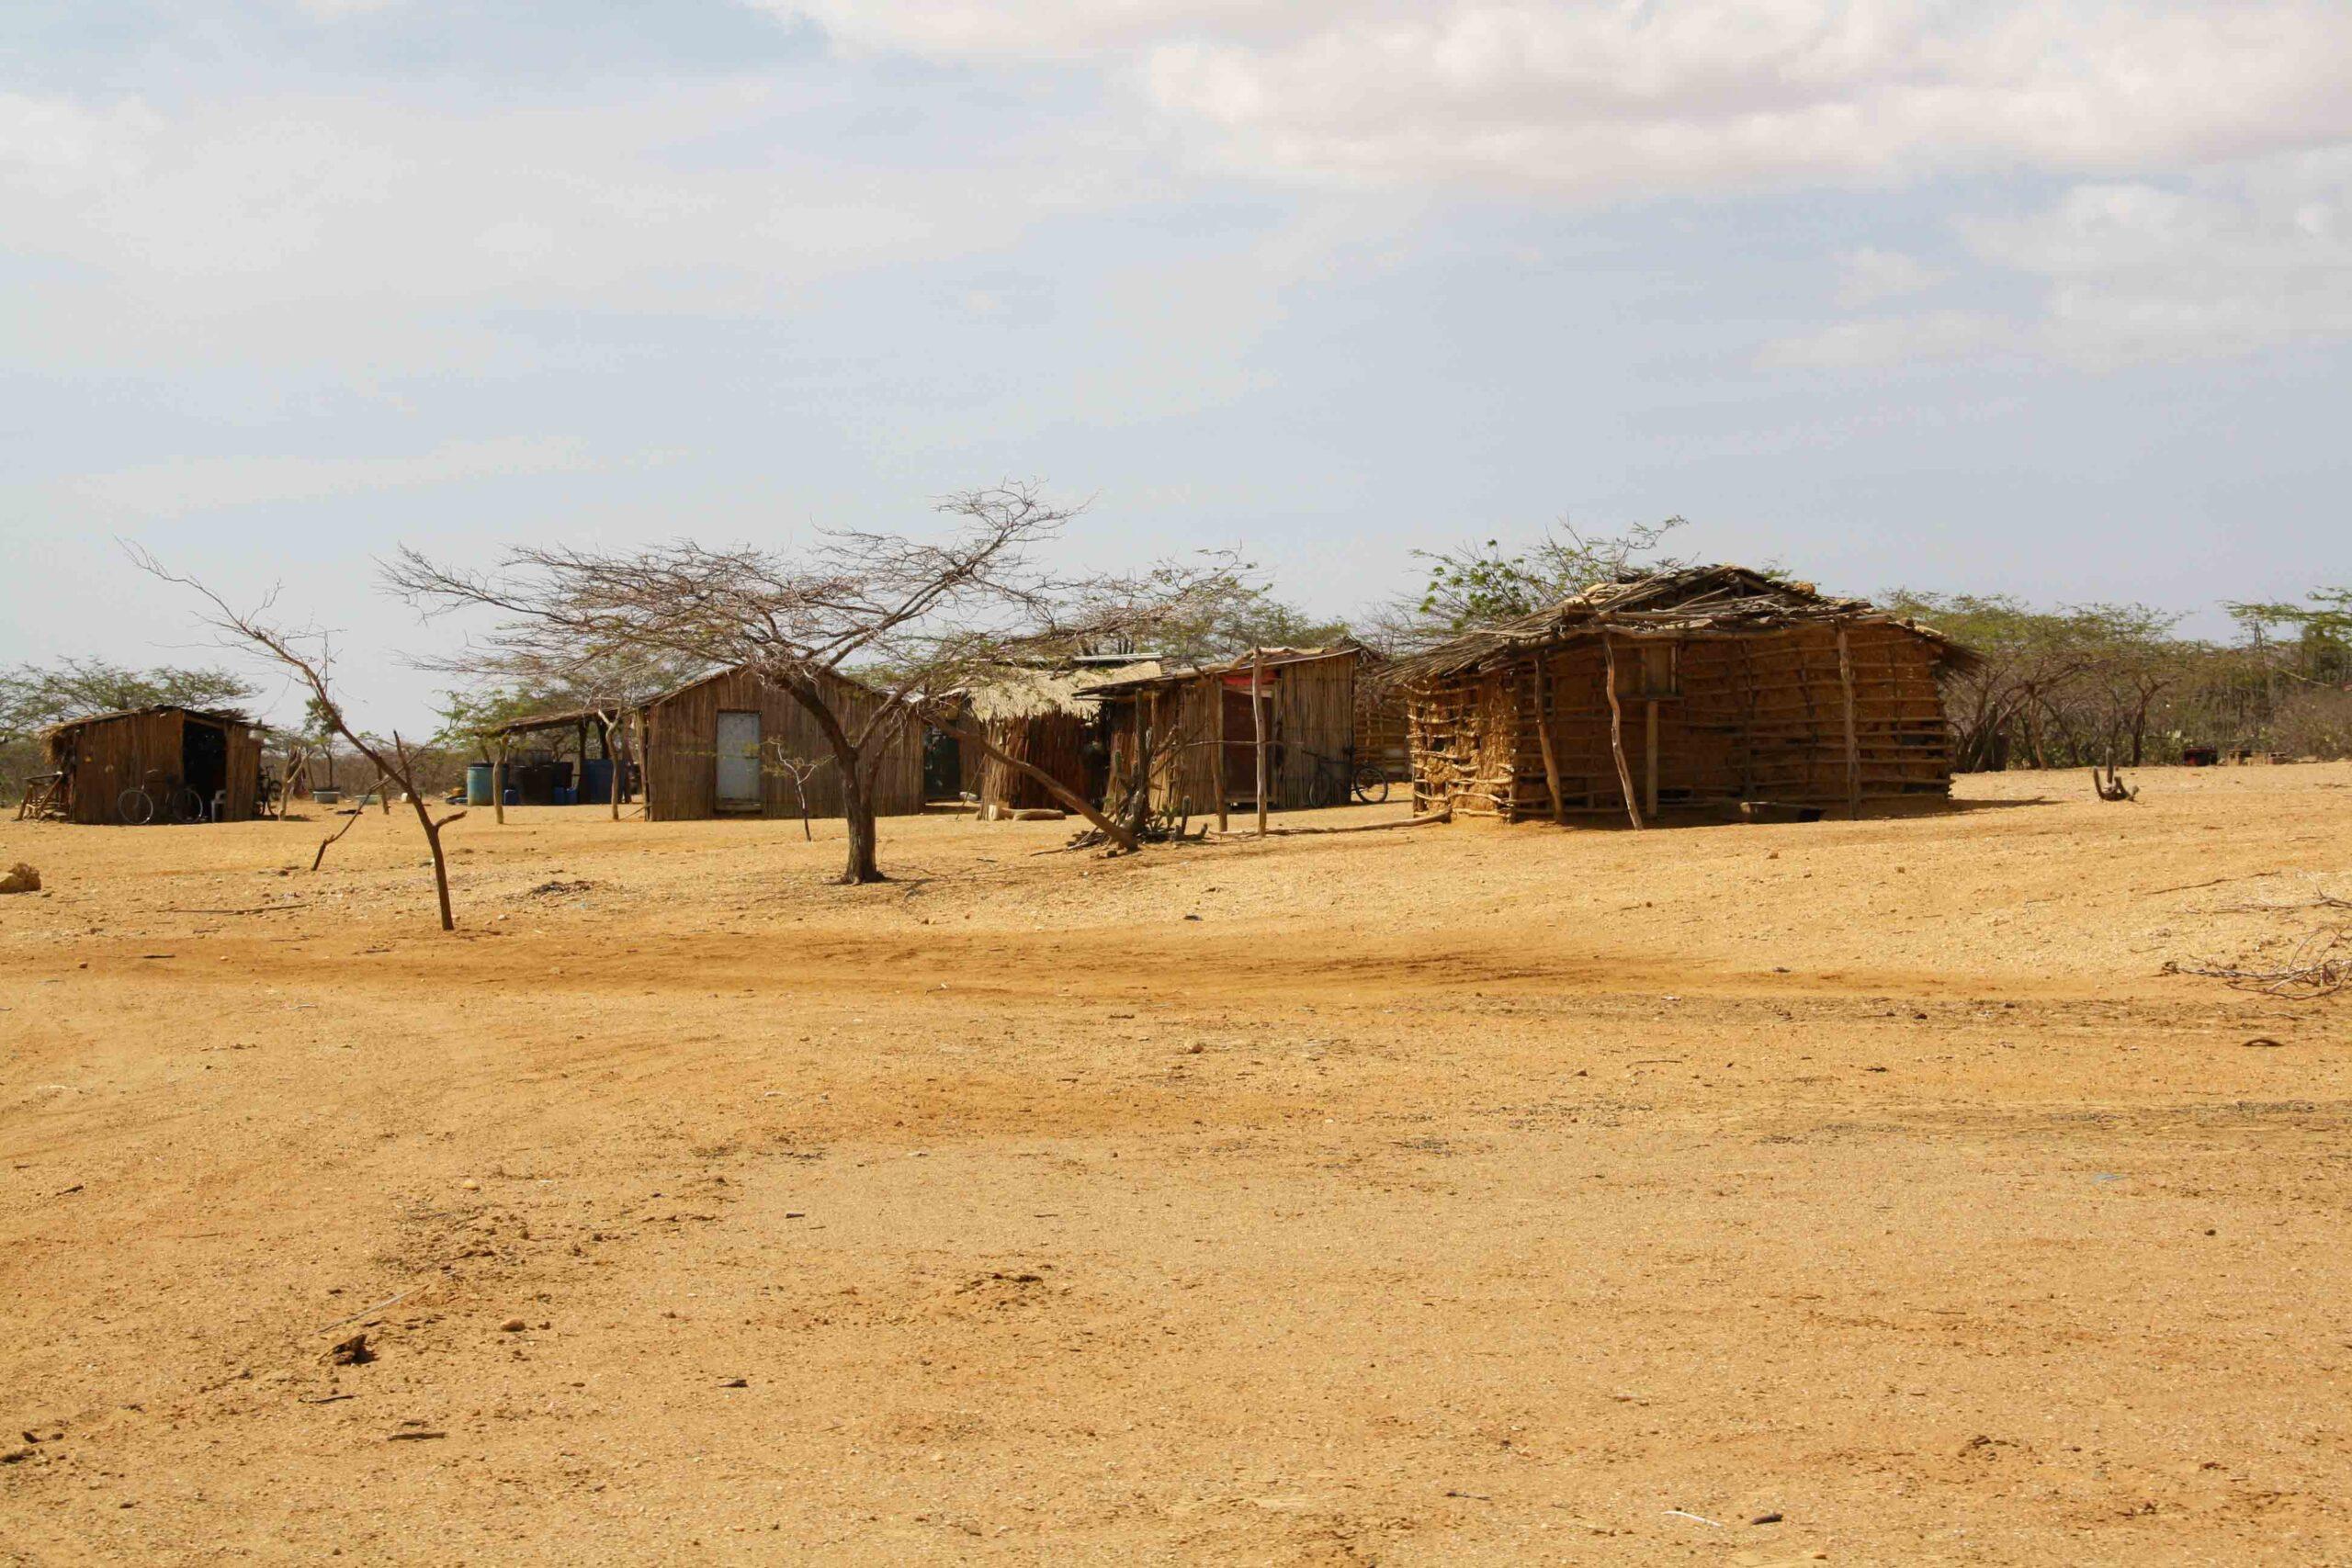 Wayuu tribe homes in the desert of La Guajira Colombia